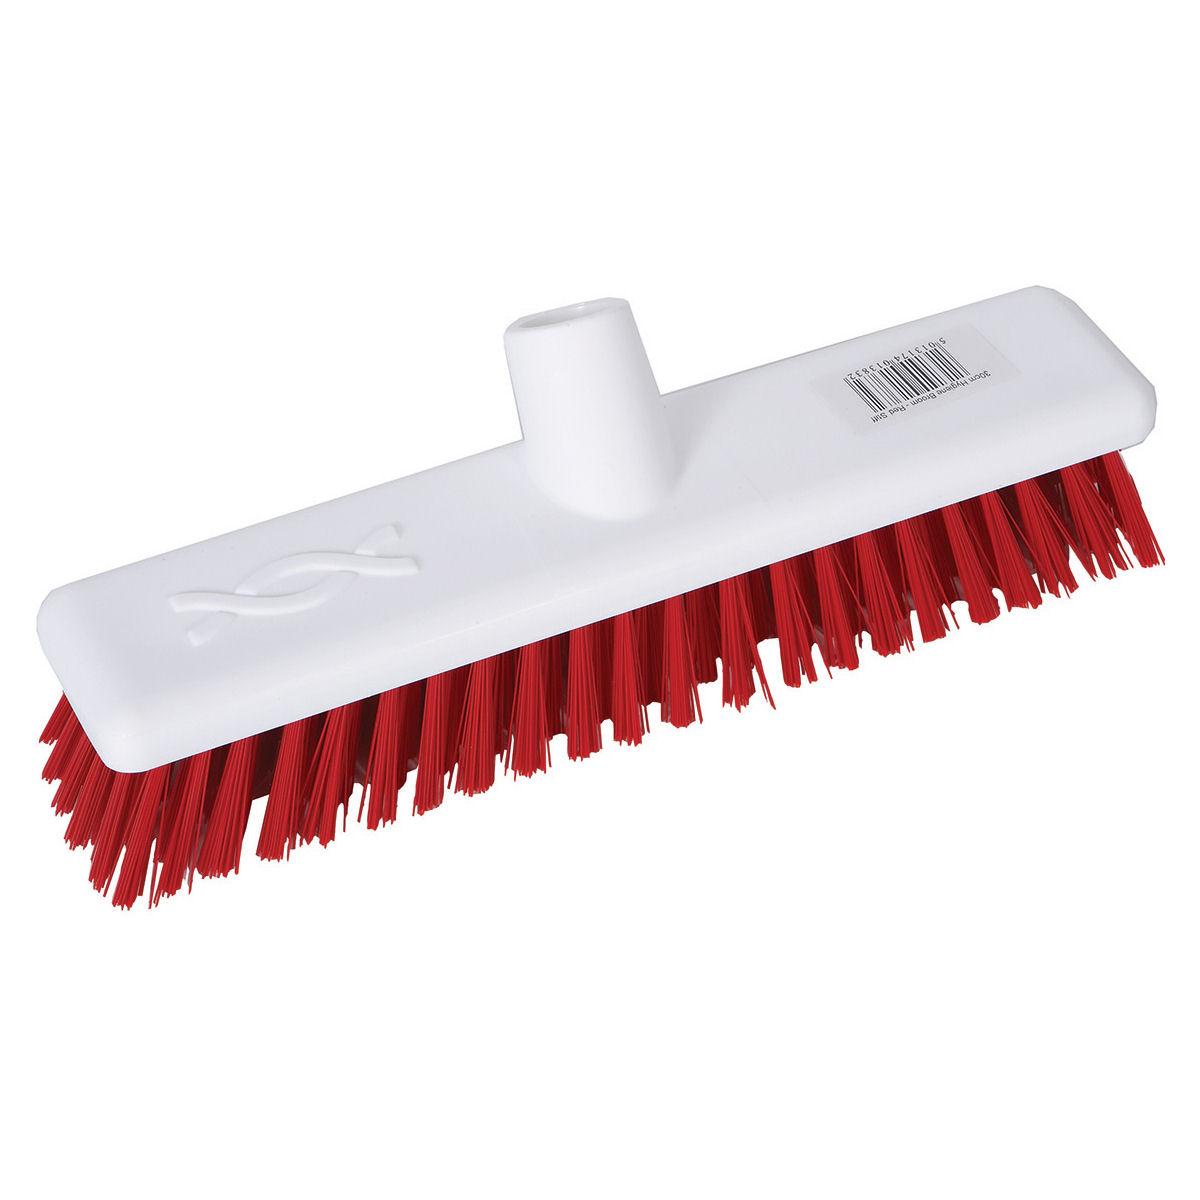 Robert Scott & Sons Abbey Hygiene Broom Head Hard Washable 12in Red Ref 102903RED